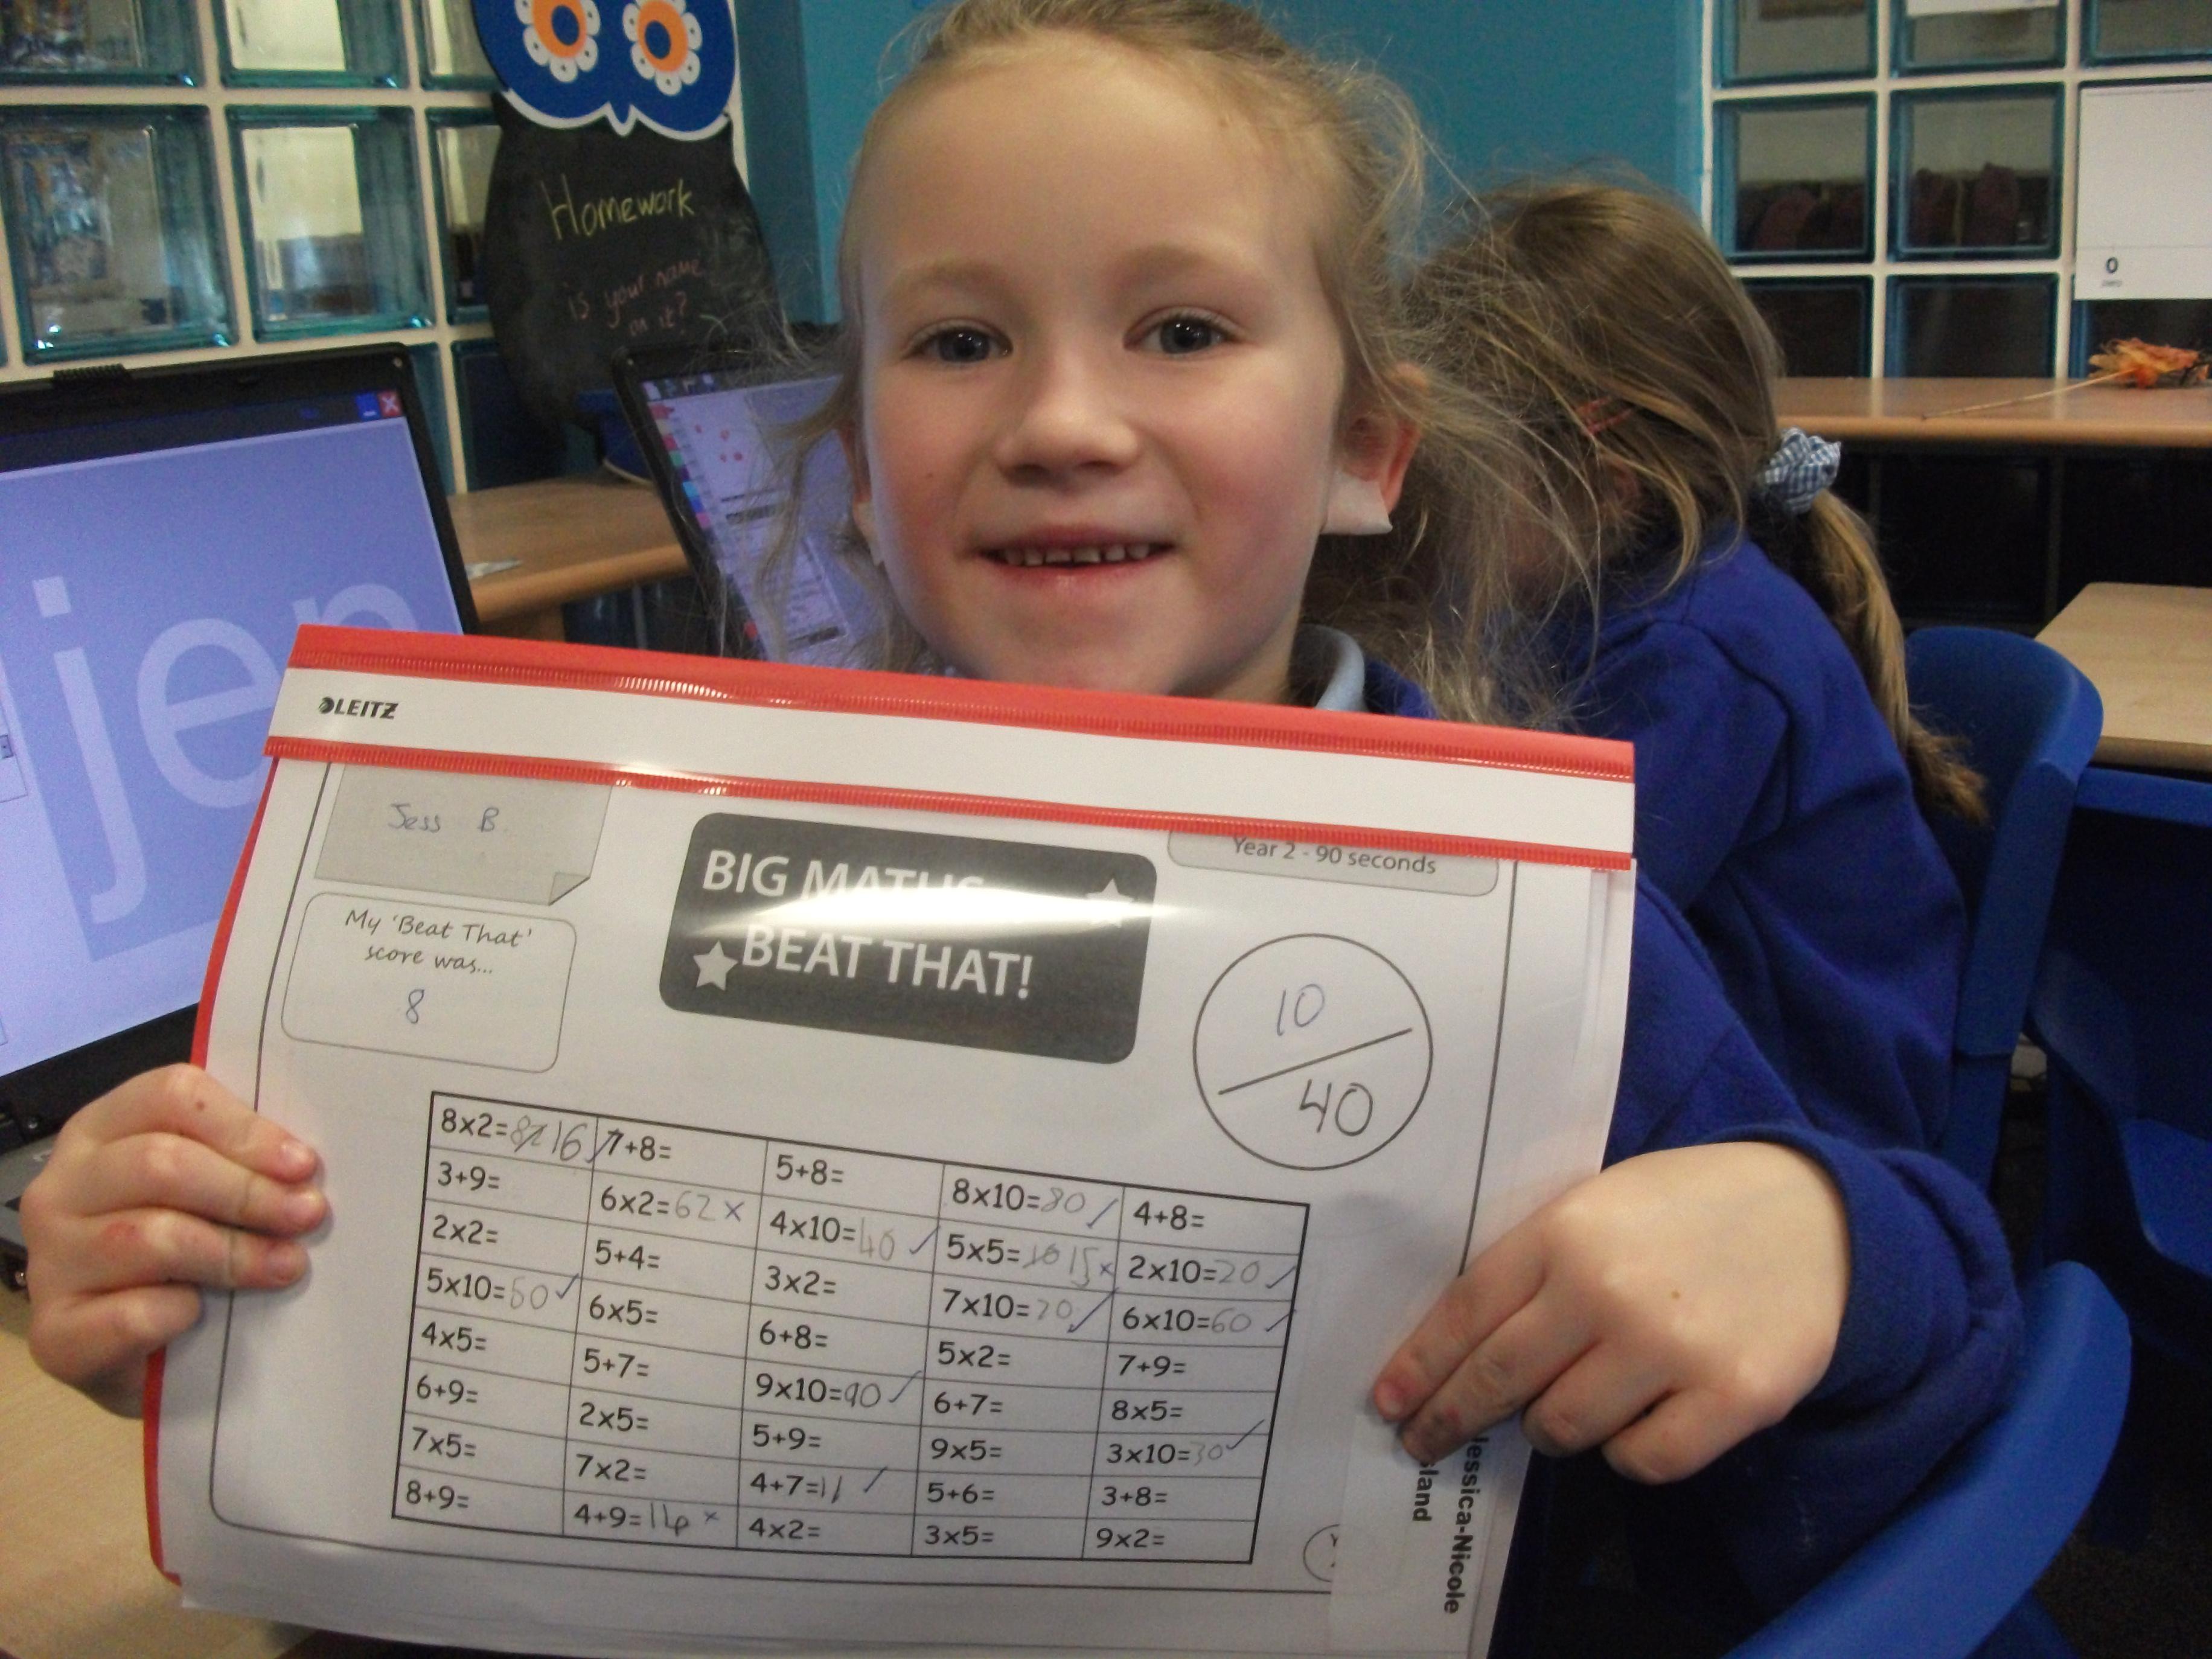 Big Math Worksheet Year 2